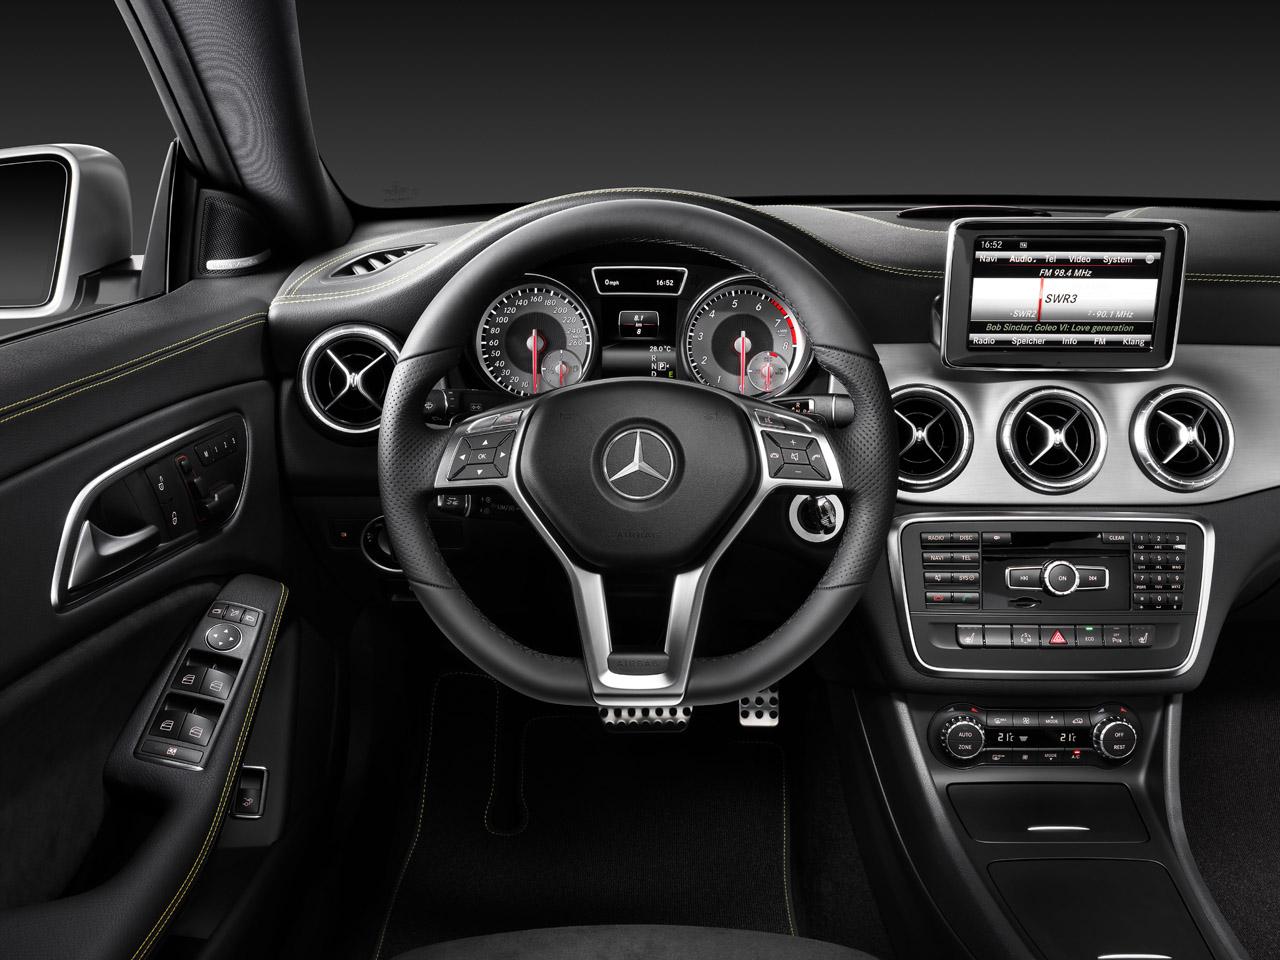 Offiicial 2014 mercedes benz cla class revealed for Mercedes benz cla 2012